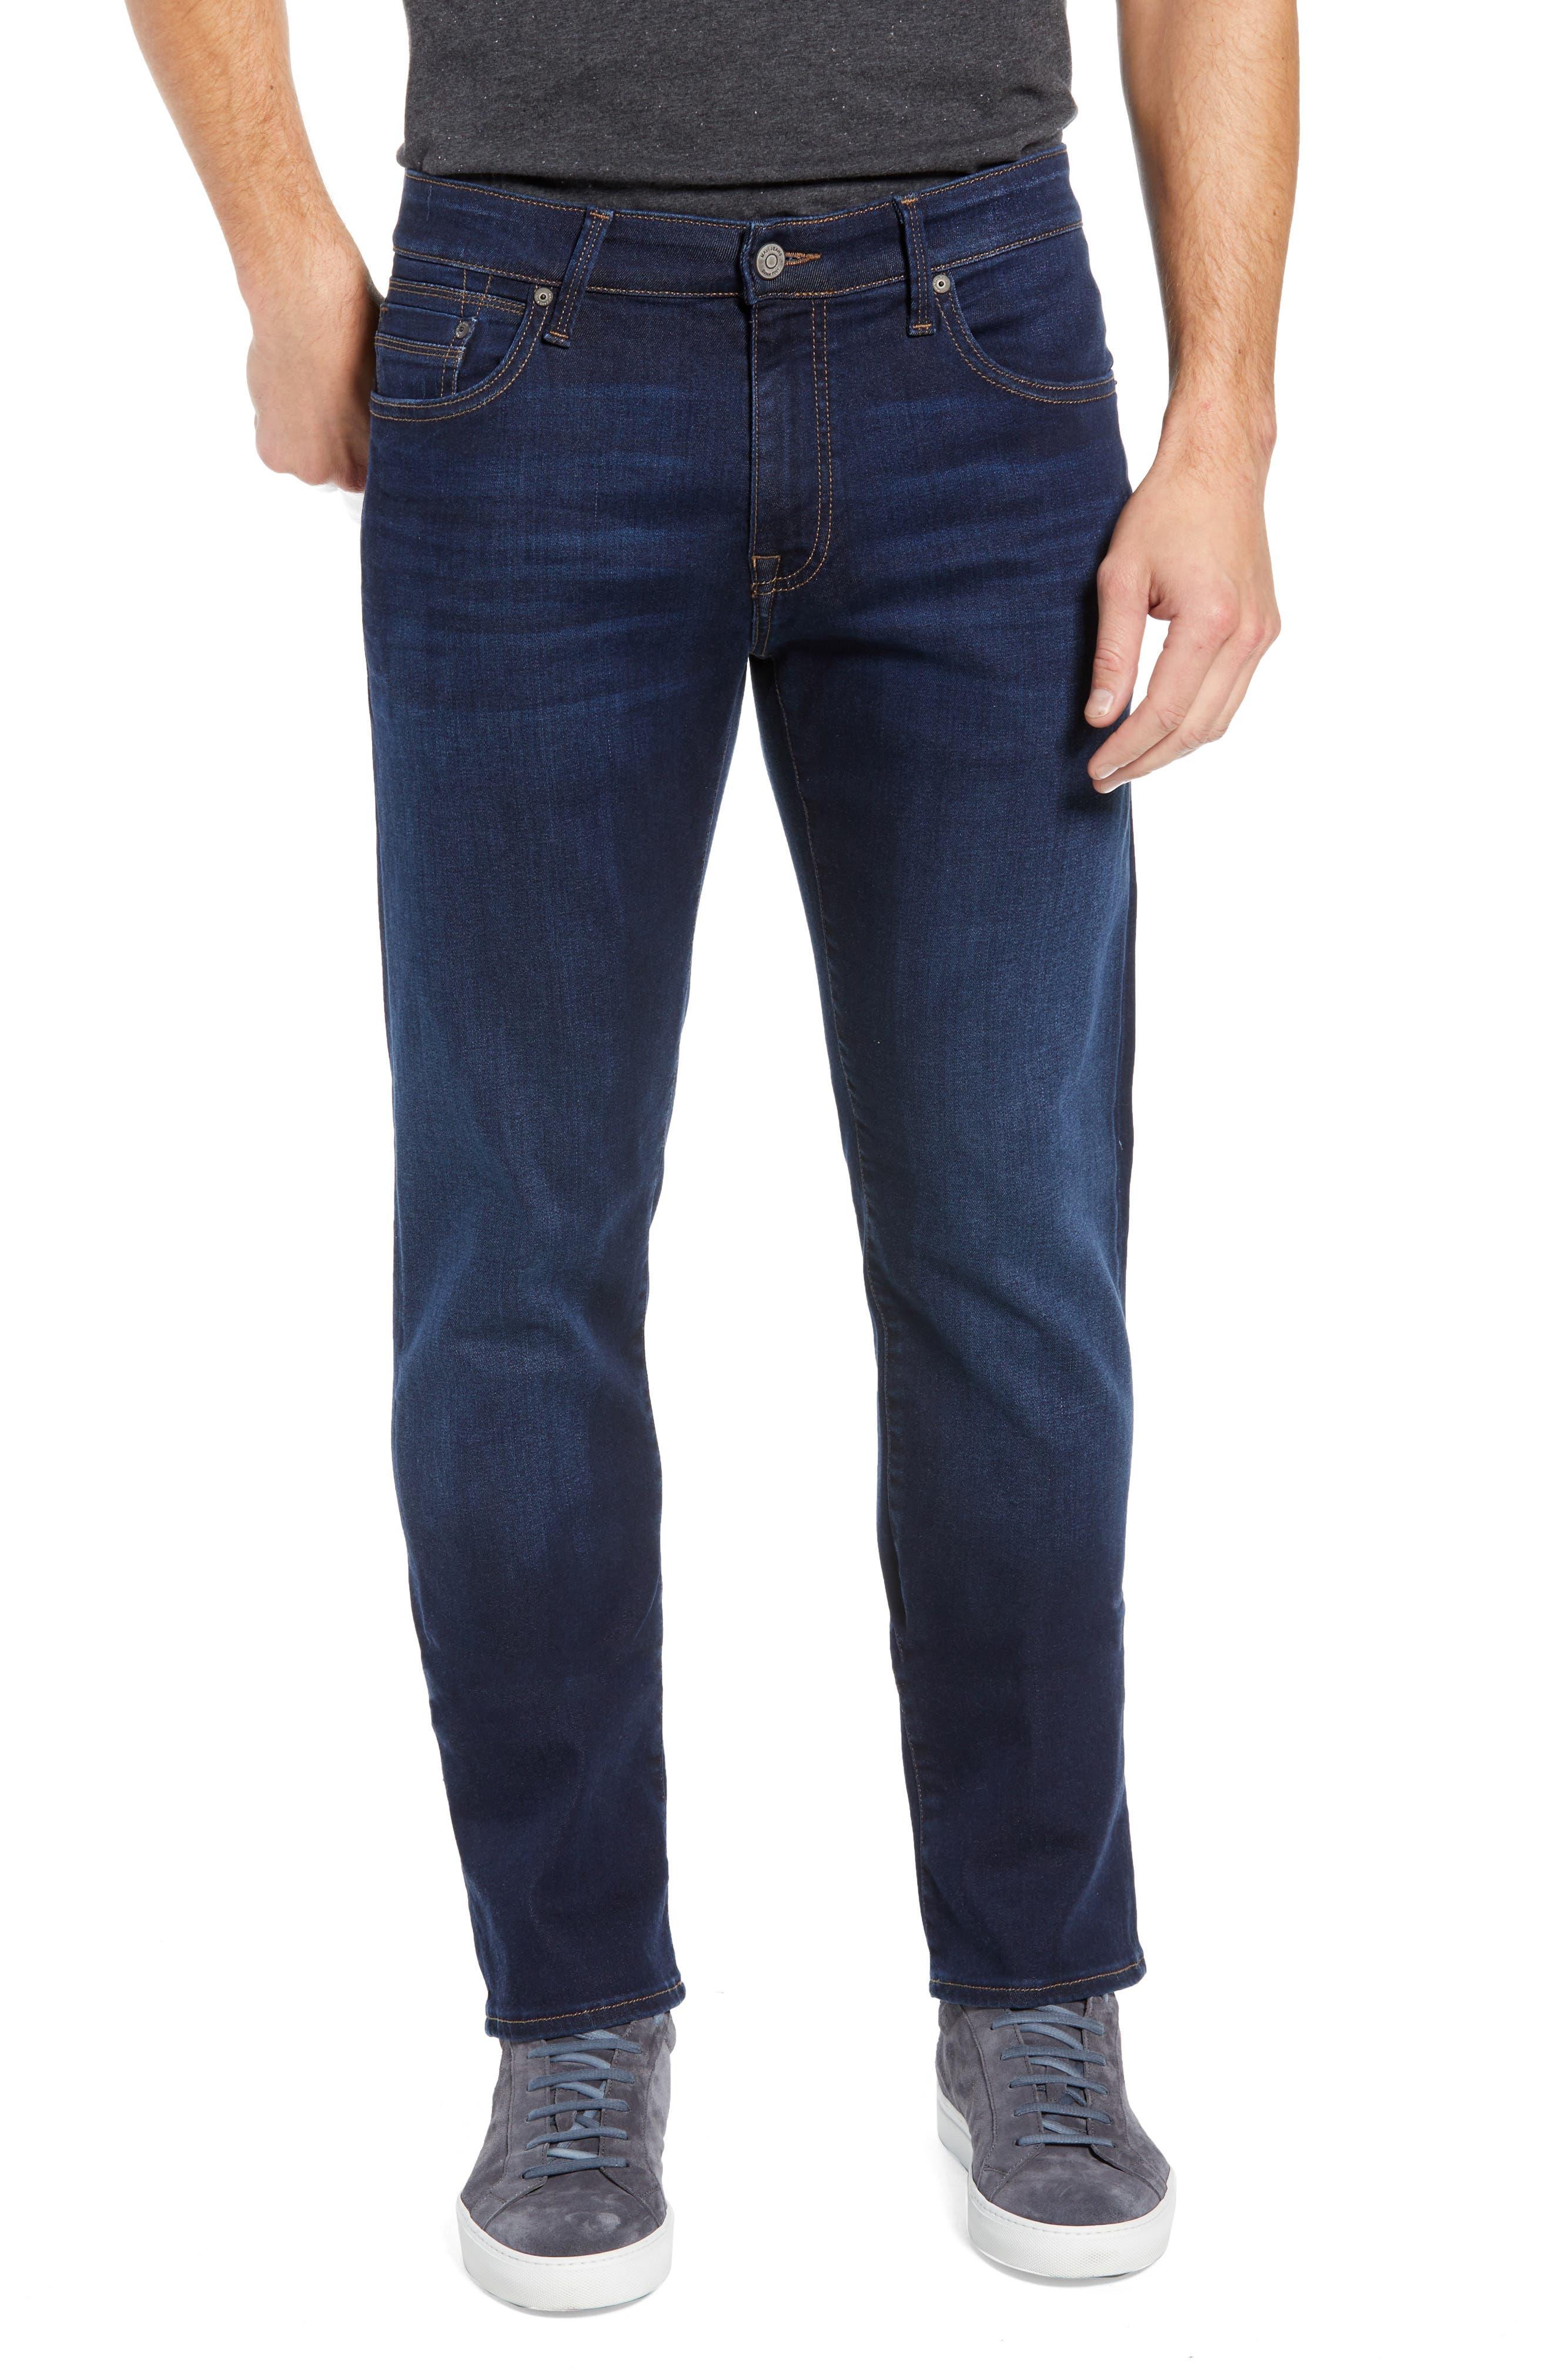 Zach Straight Leg Jeans,                             Main thumbnail 1, color,                             DEEP SOFT MOVE